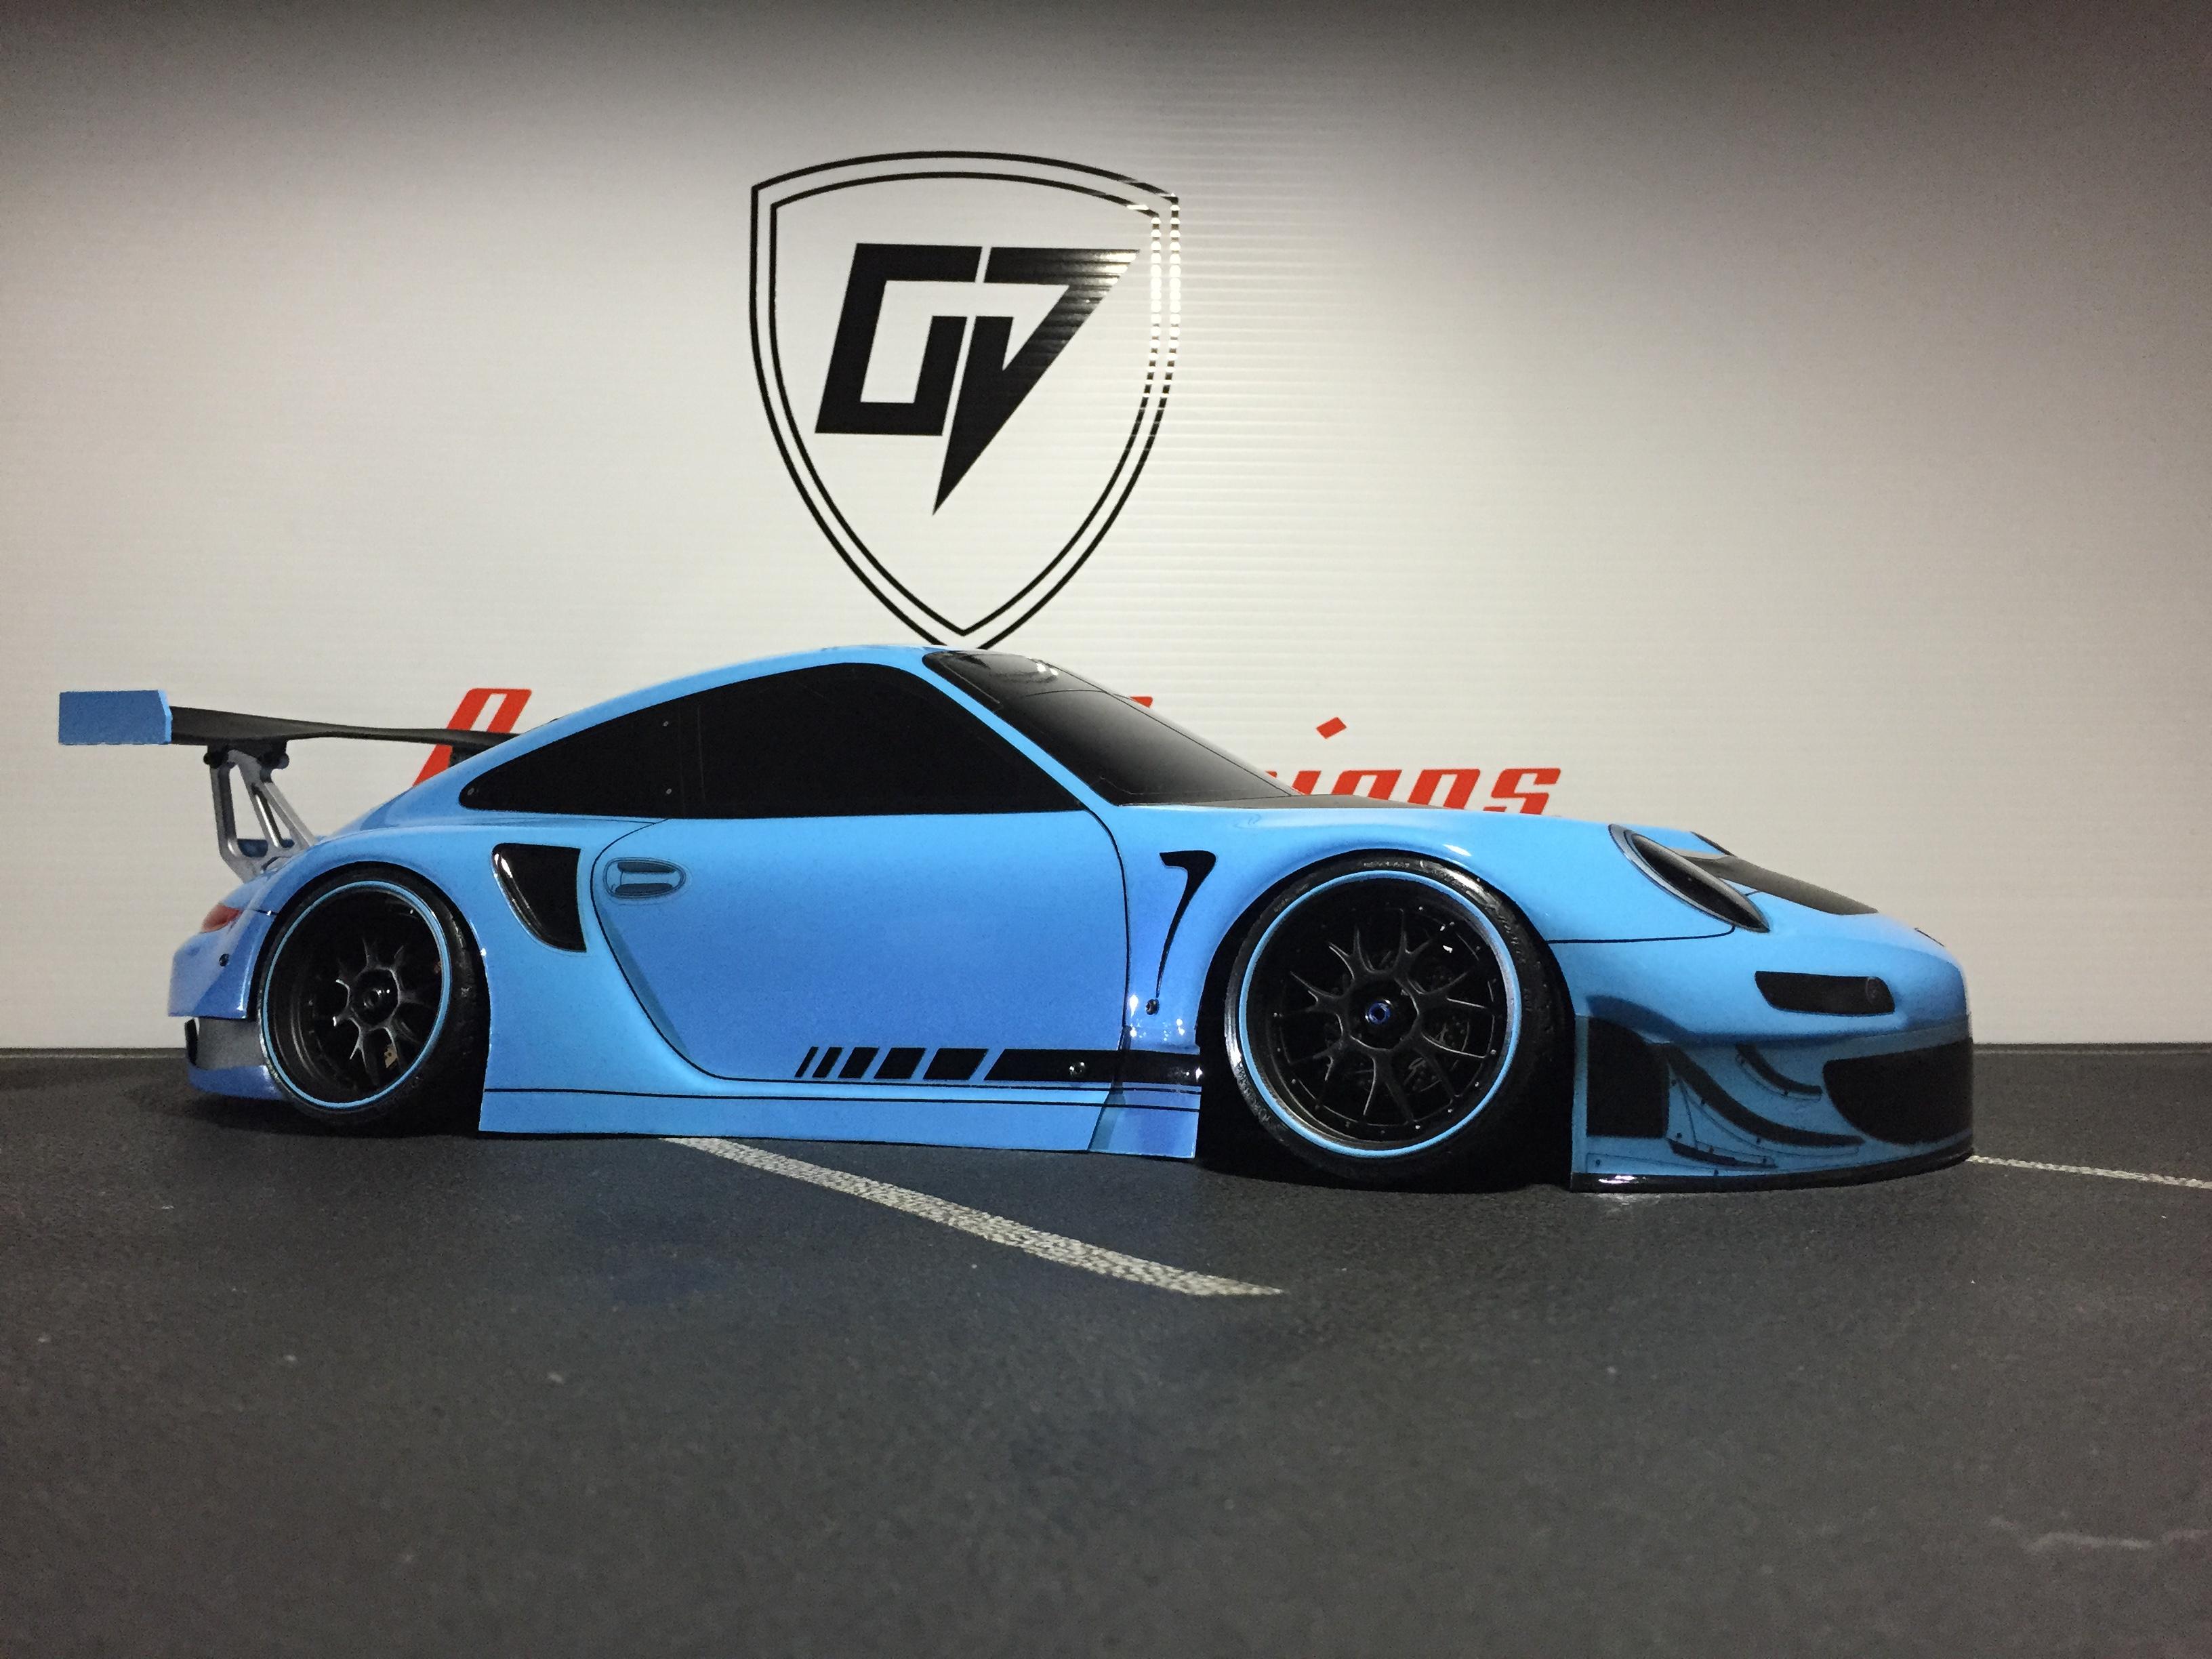 009 Stunning Porsche 911 Gt2 Body Kit Cars Trend